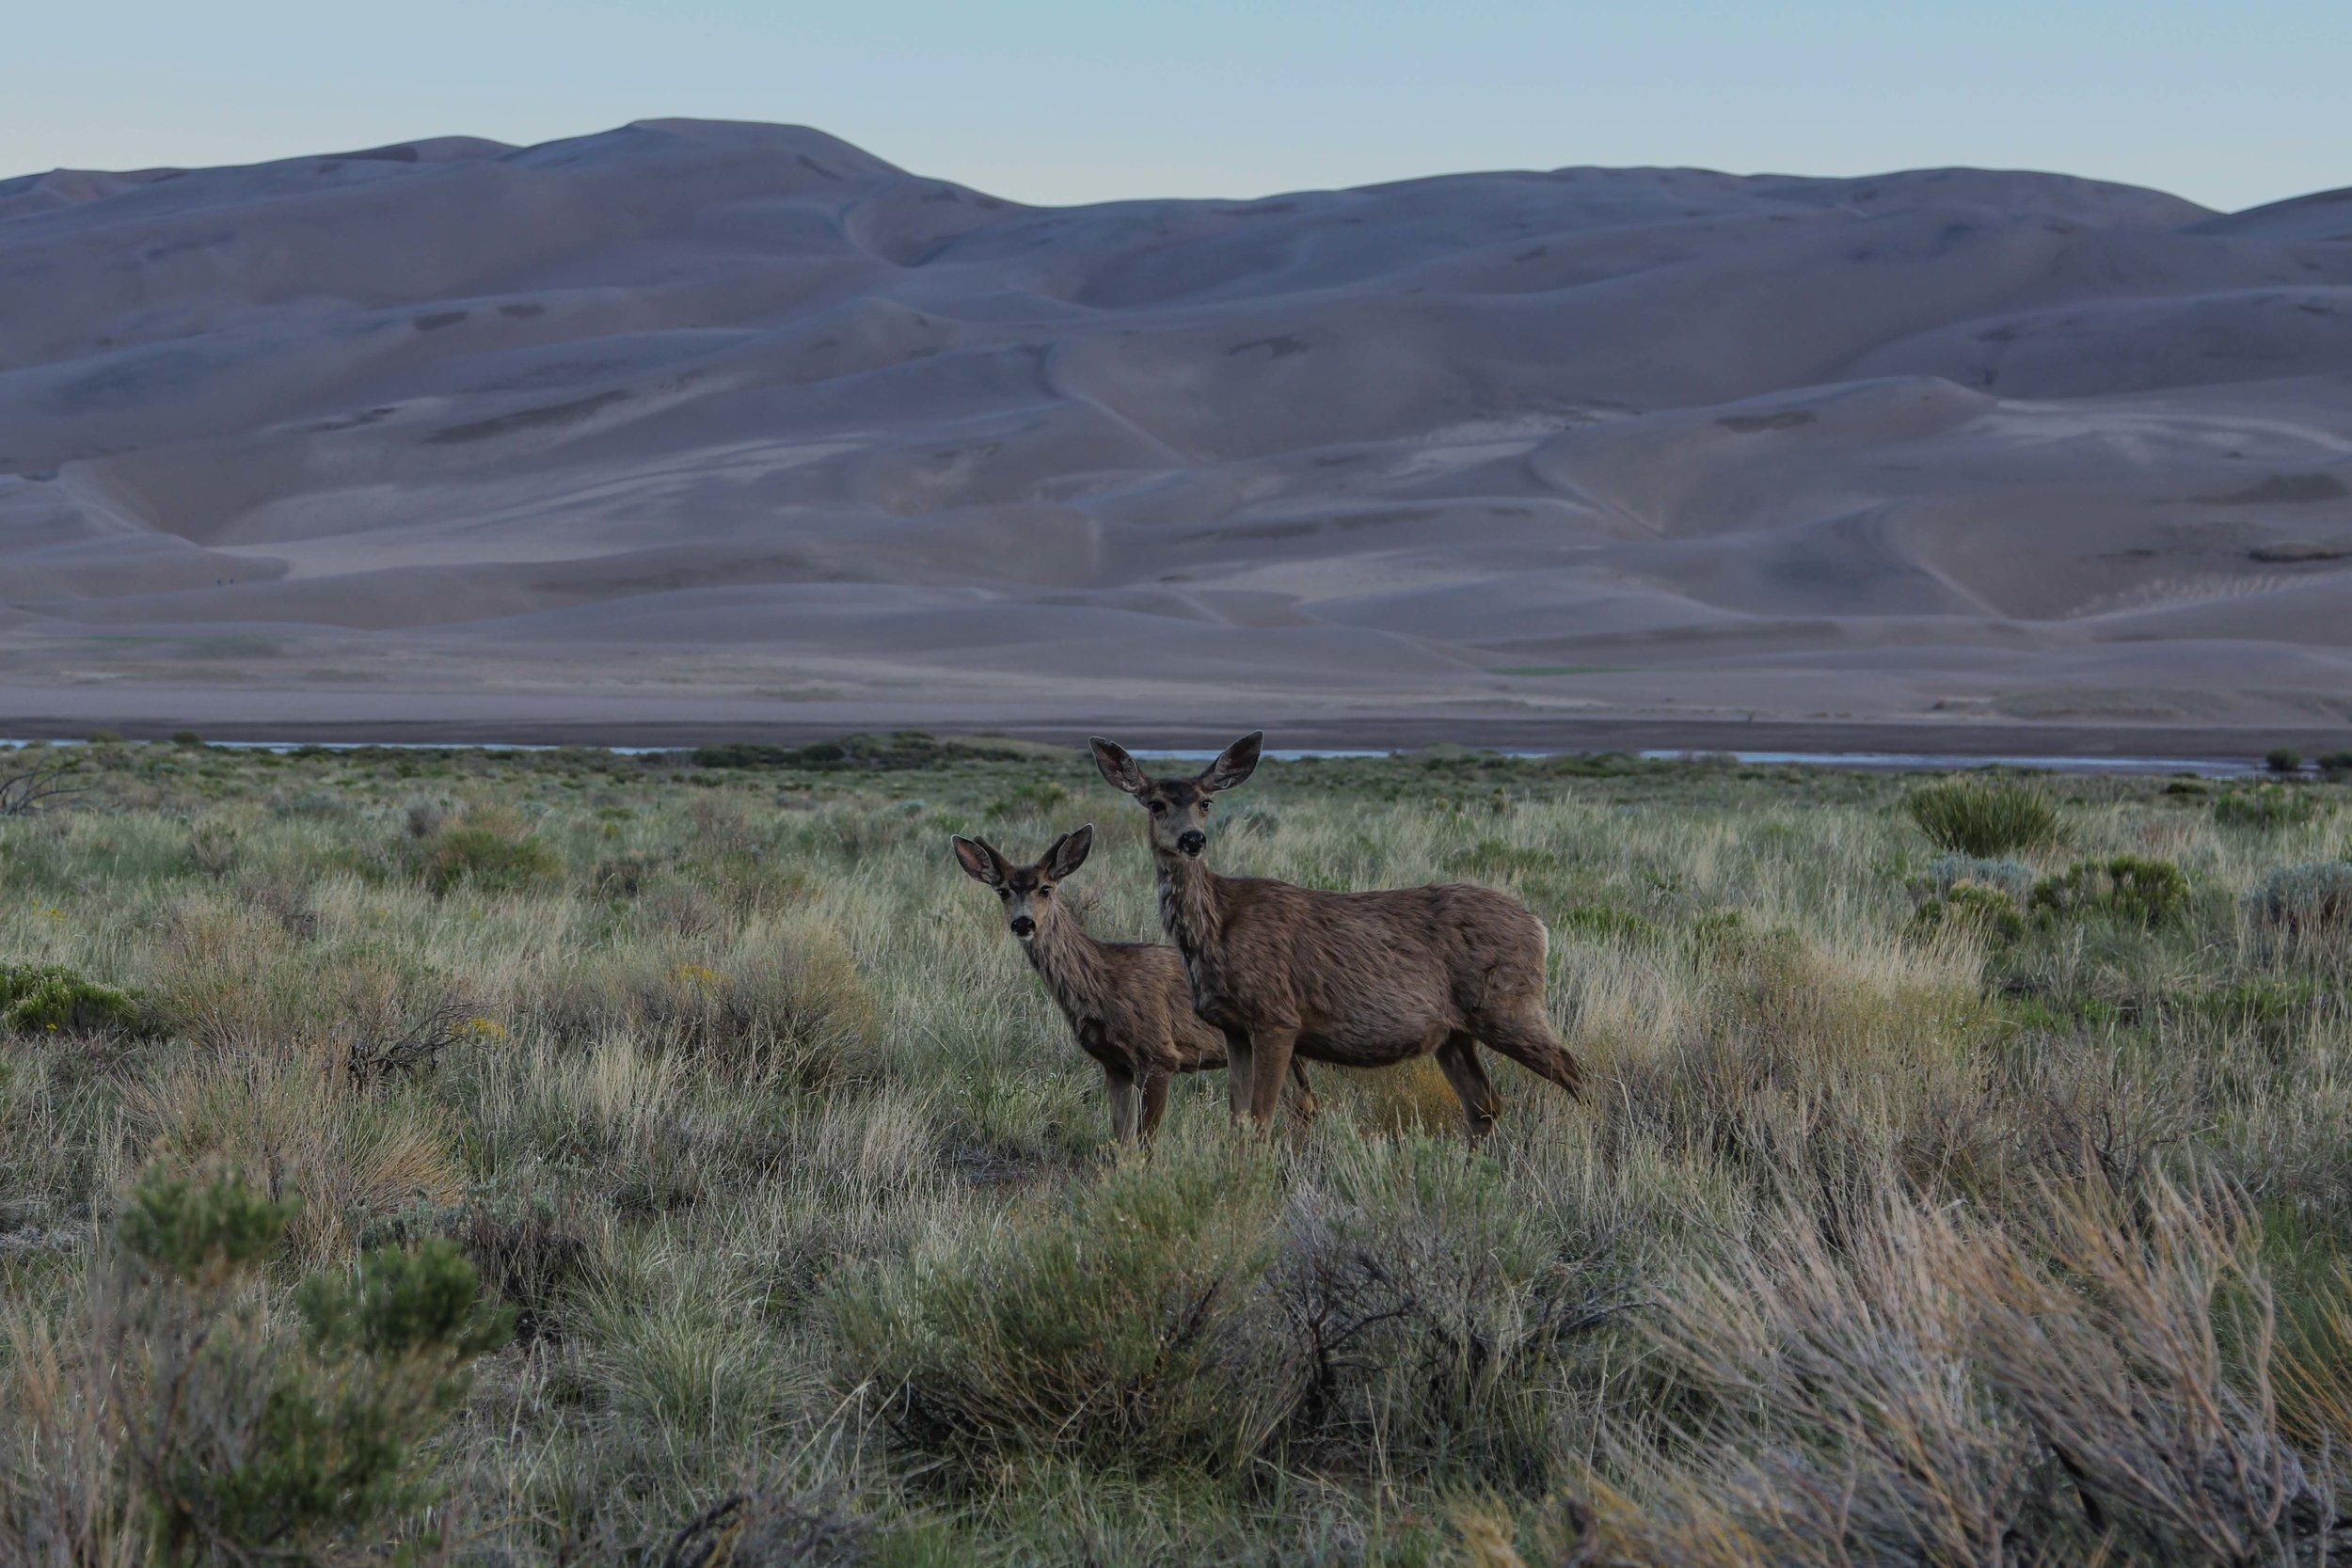 Great Sand Dunes National Park Colorado USA (10 of 11).jpg